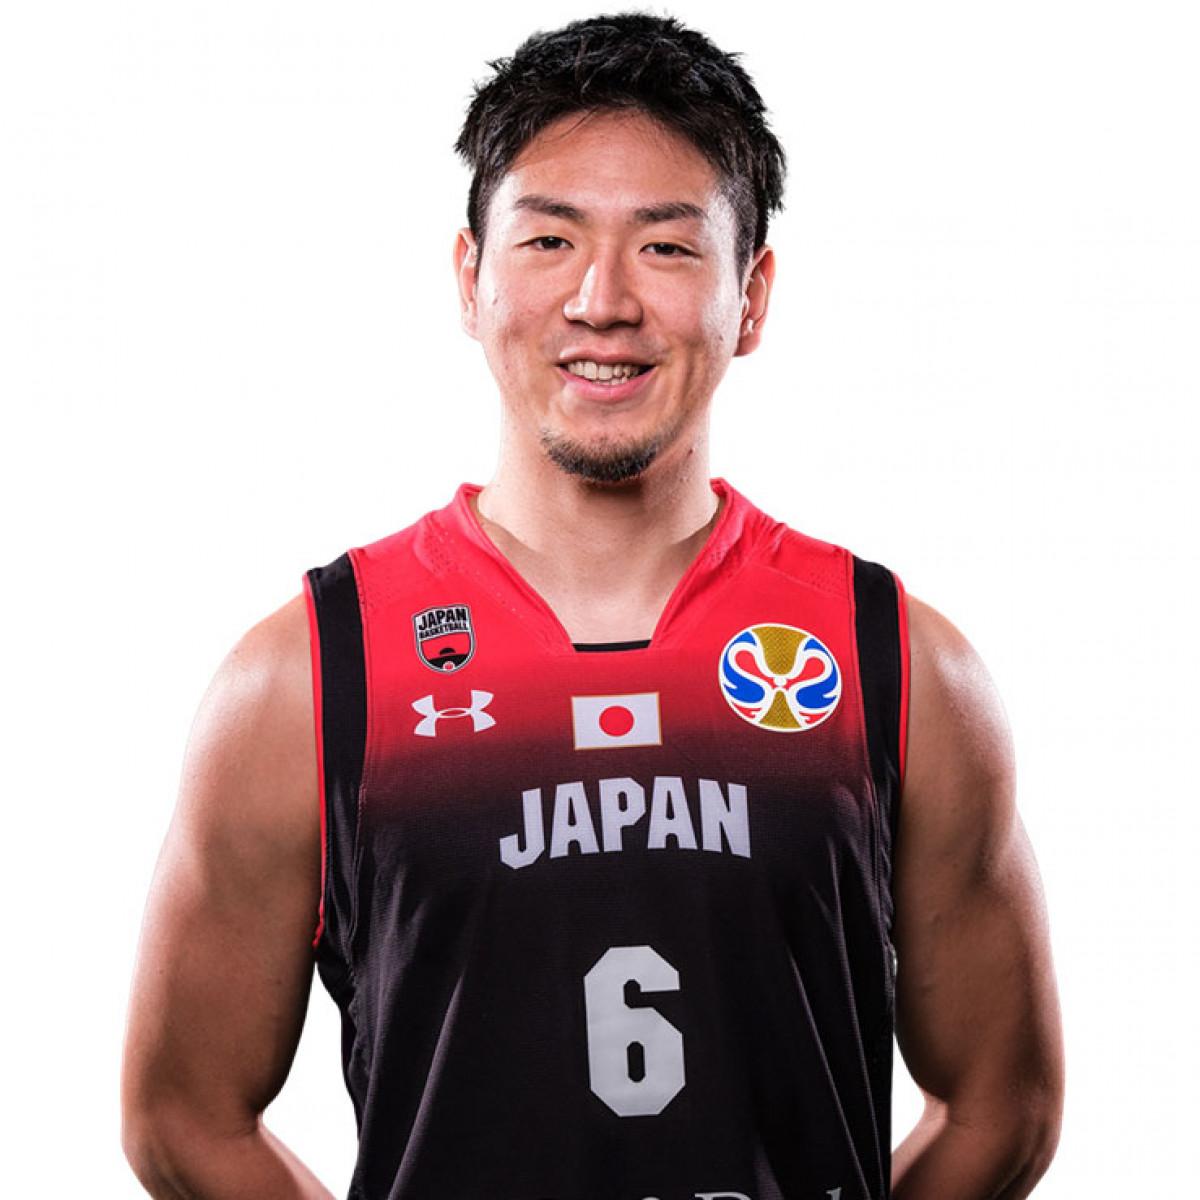 Photo of Makoto Hiejima, 2019-2020 season